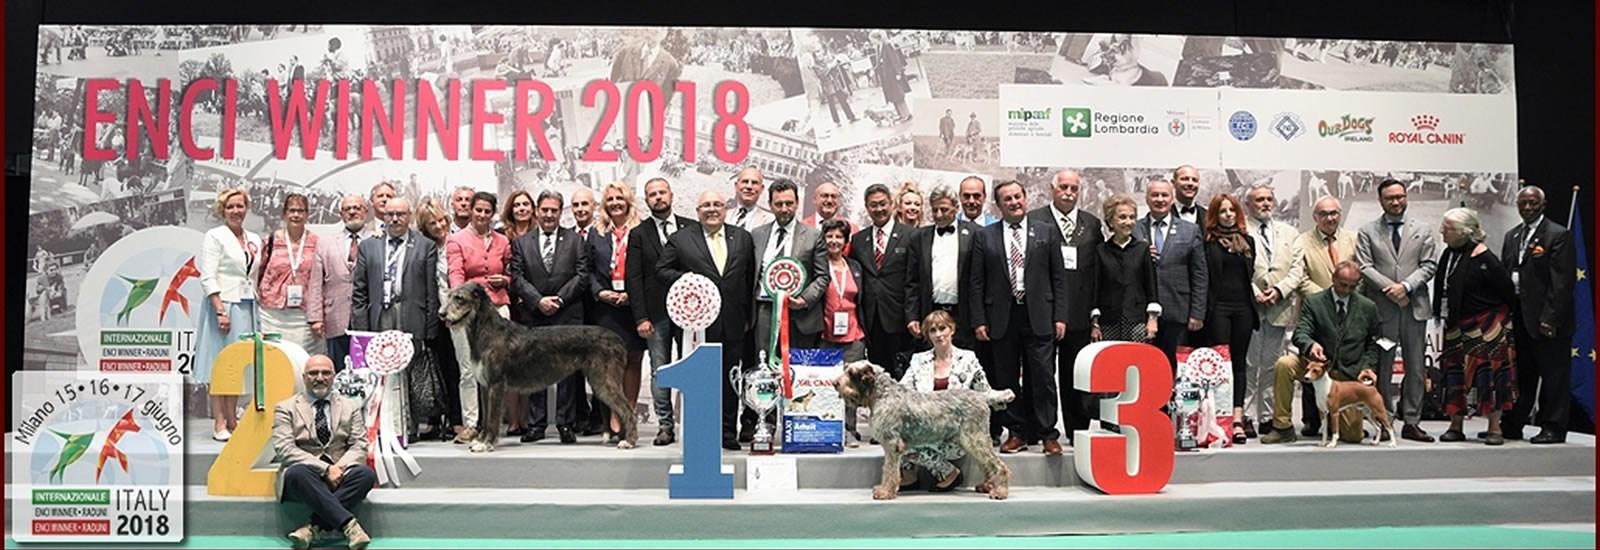 Home Enci Winner 2018 Milan